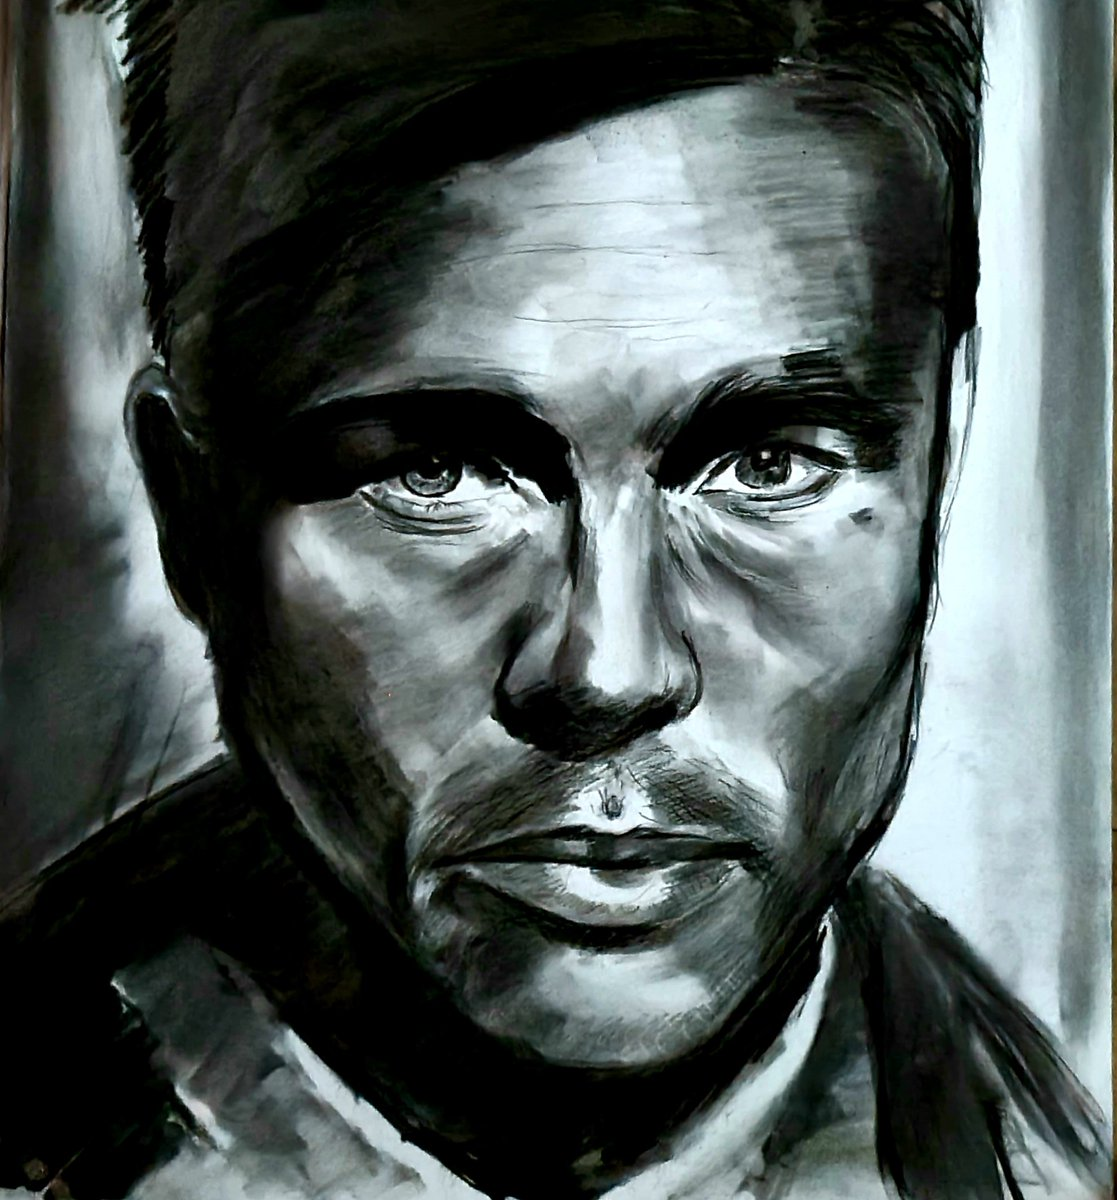 Finished... my drawing of Brad Pitt #bradpitt #drawing #portraitdrawing #art